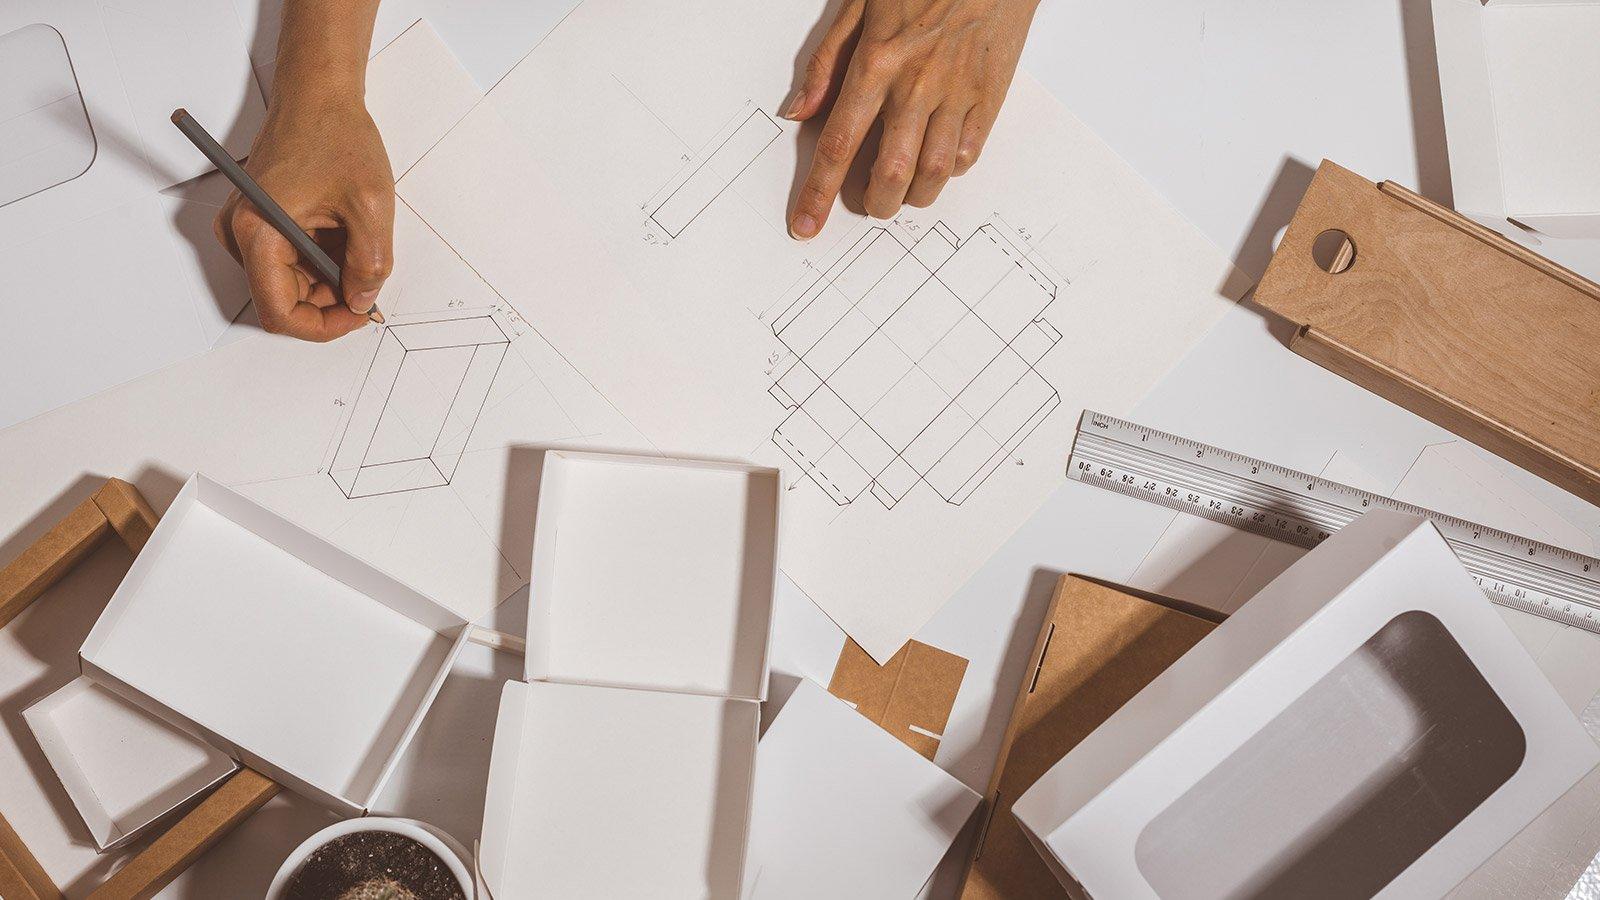 Designer drawing a mockup for economic cardboard box